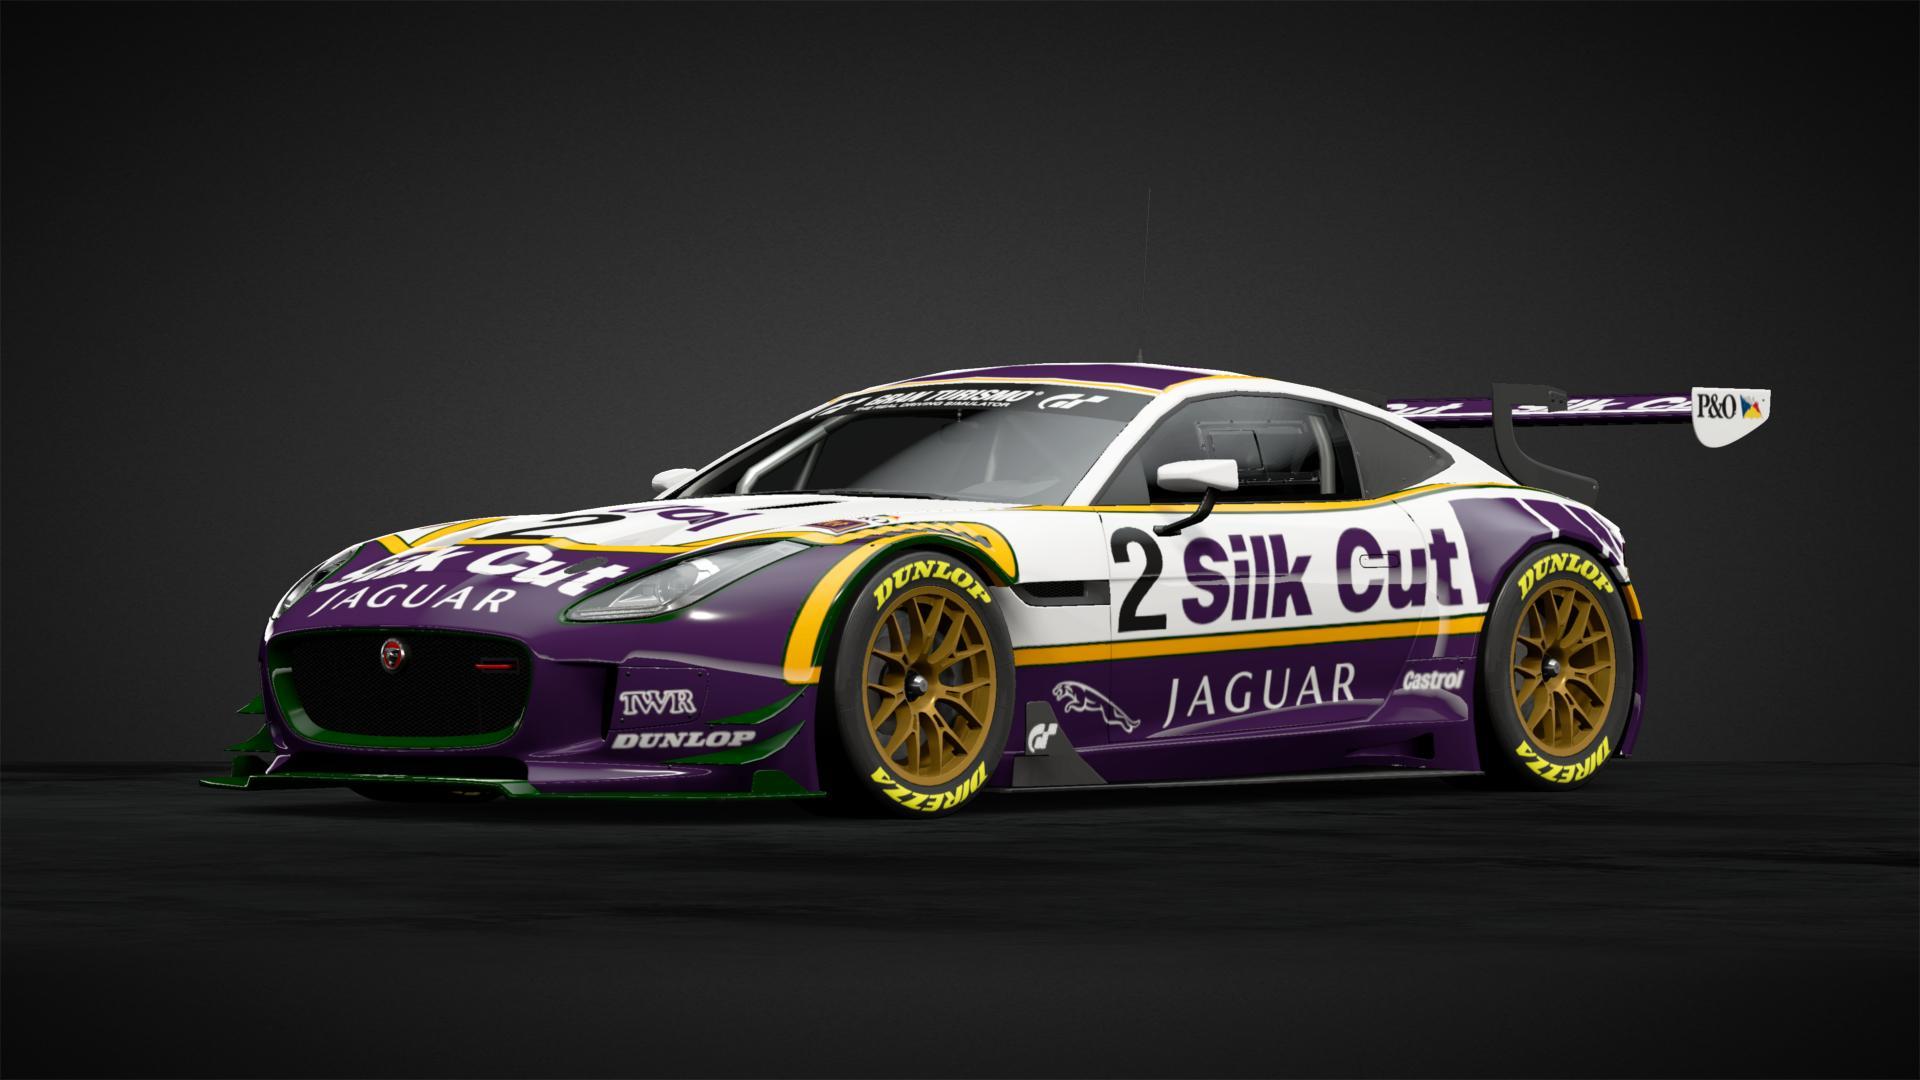 Silk Cut Jaguar XJR-9 - Car Livery by nonfixshun | Community | Gran Turismo Sport - gran-turismo.com